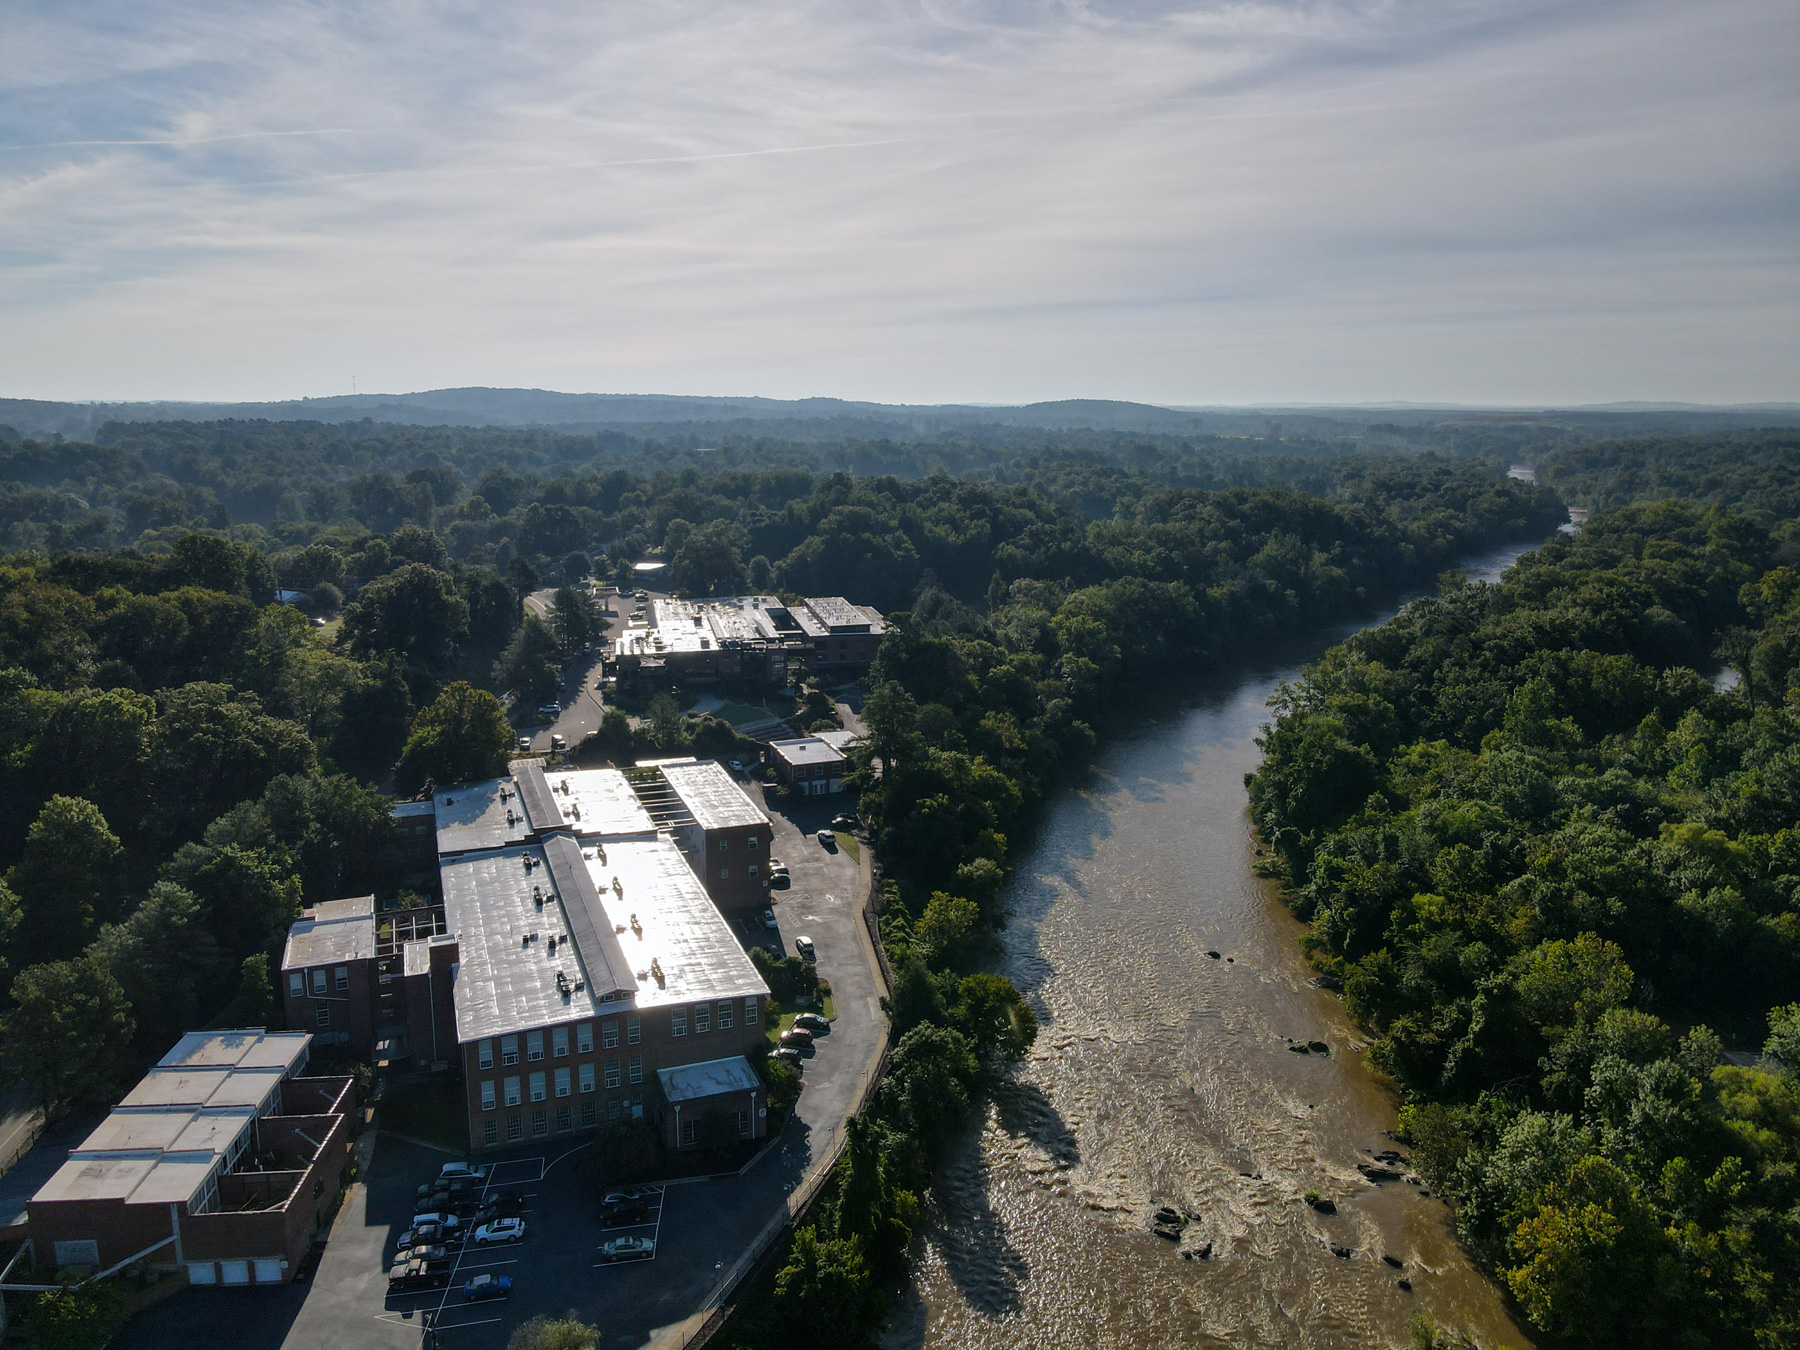 The Haw River flowing through Saxapahaw, North Carolina